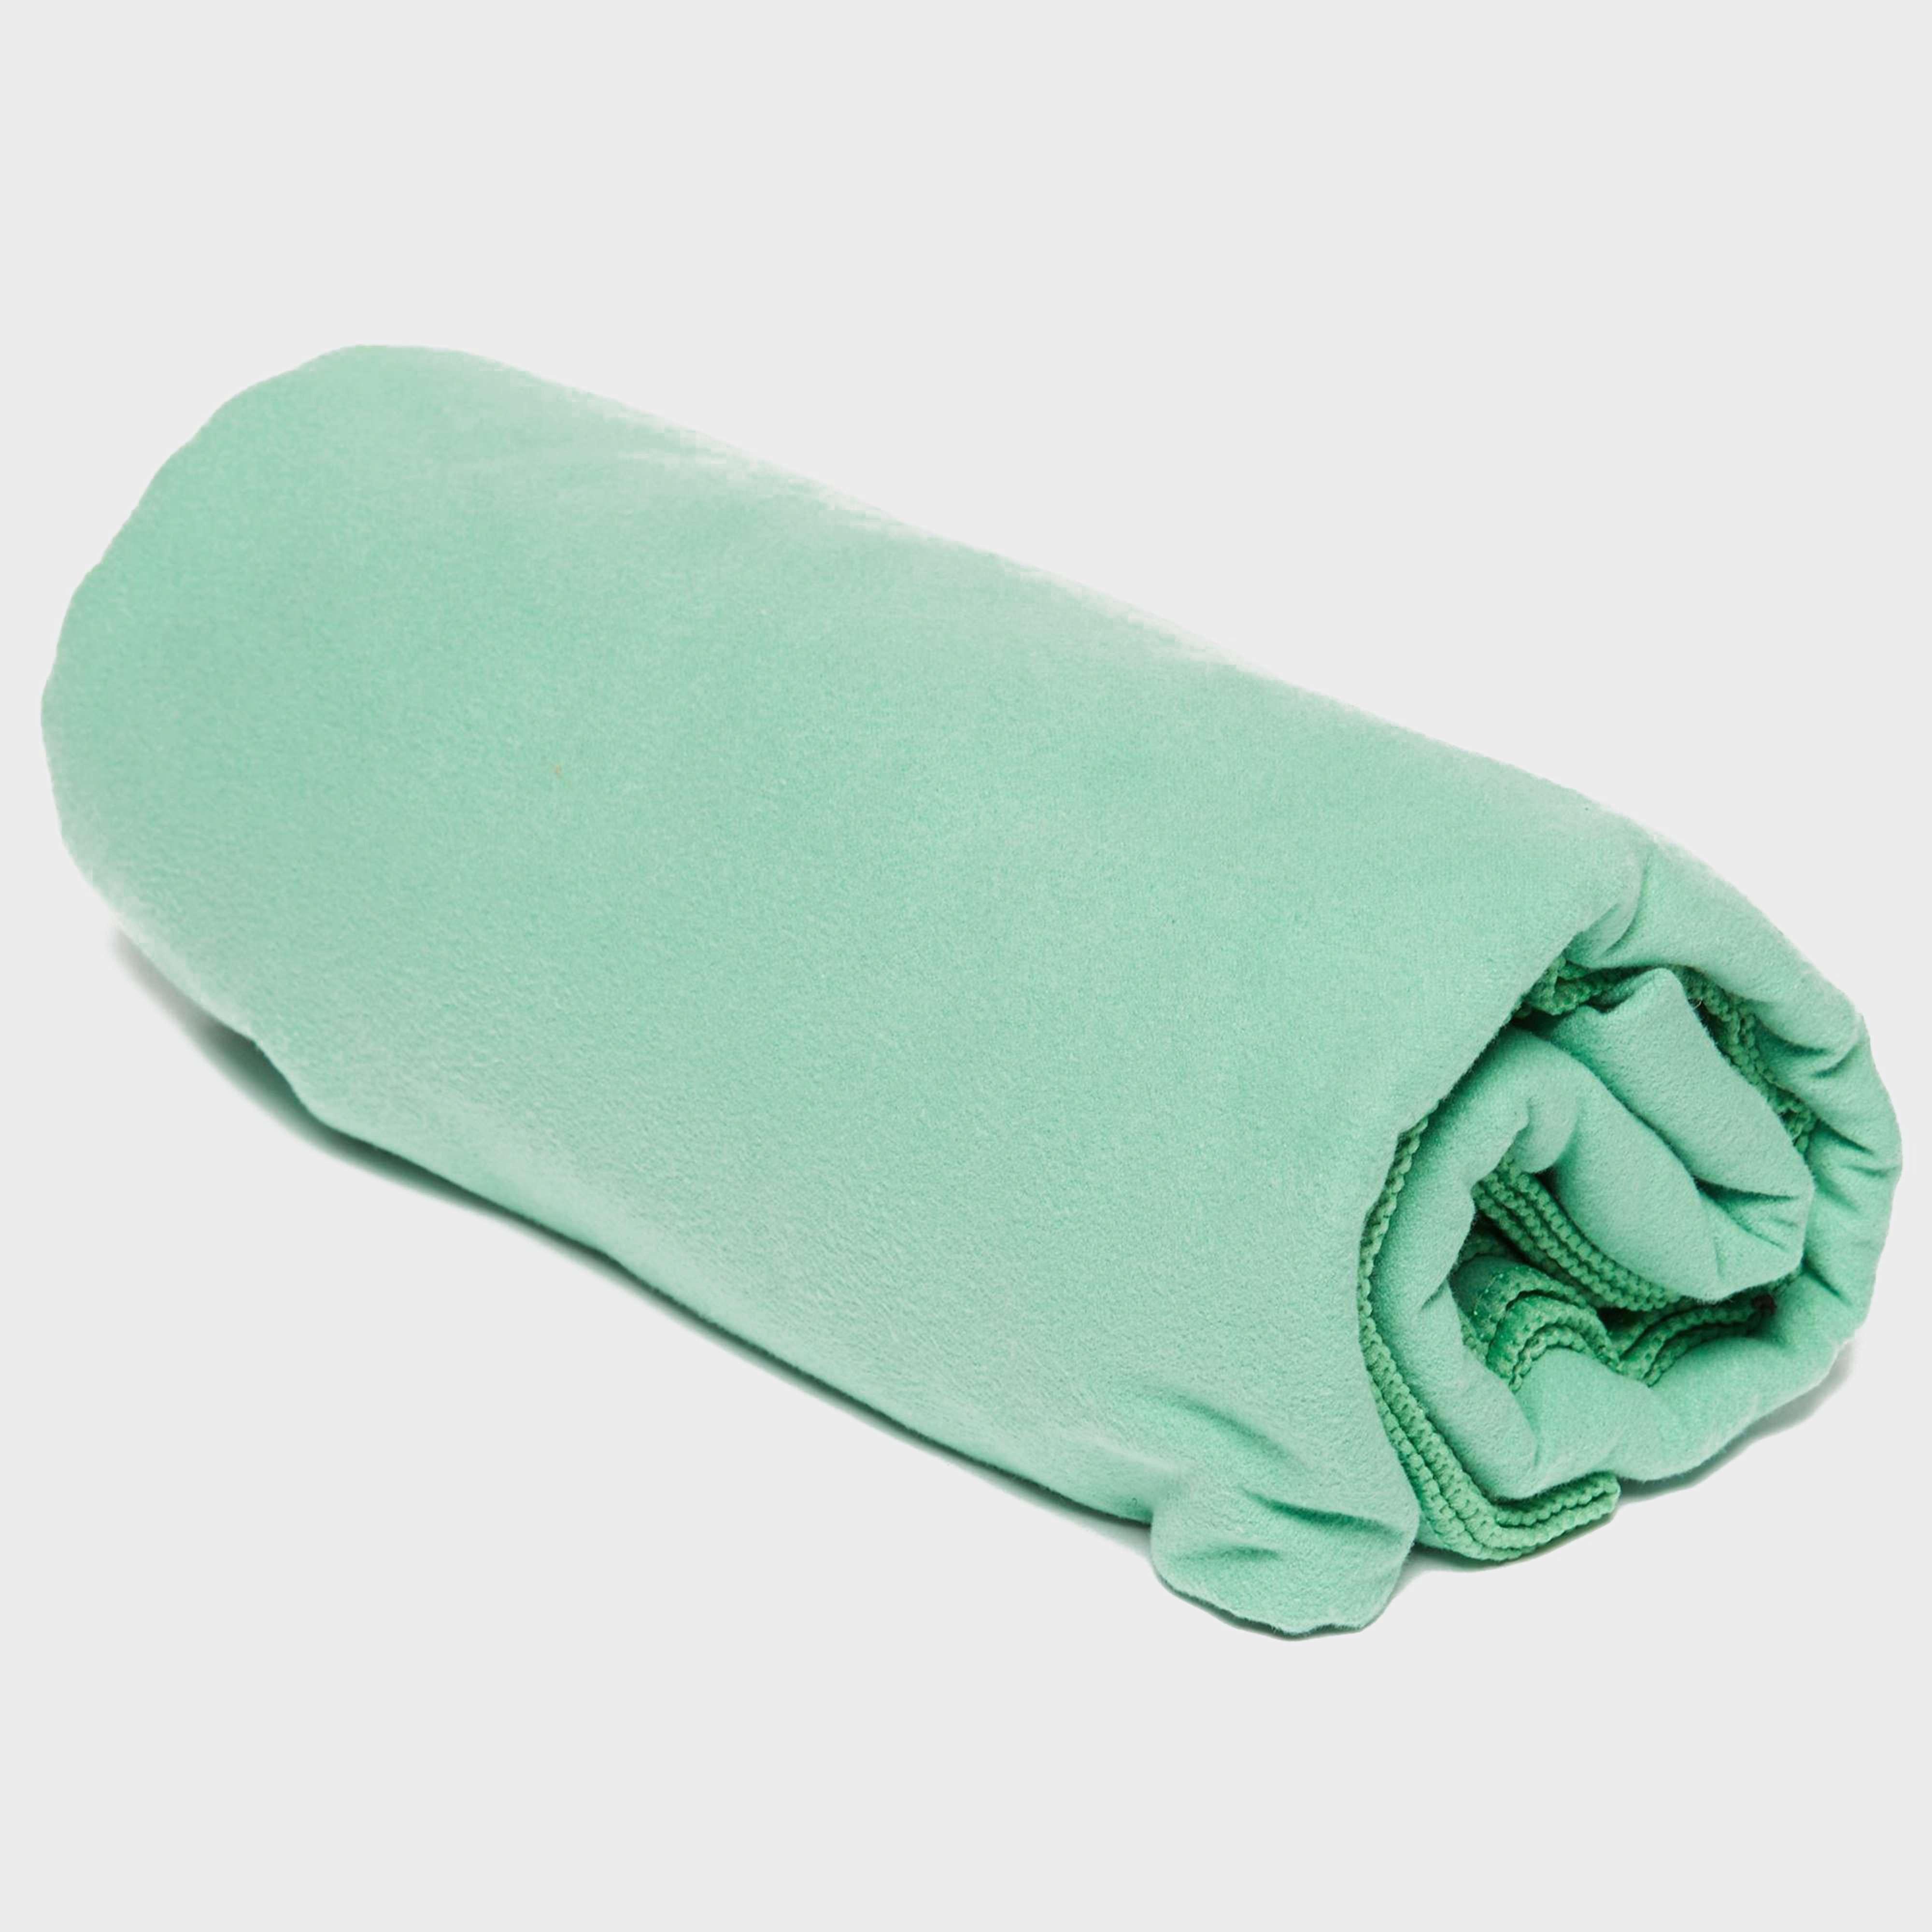 EUROHIKE Suede Microfibre Travel Towel - Large